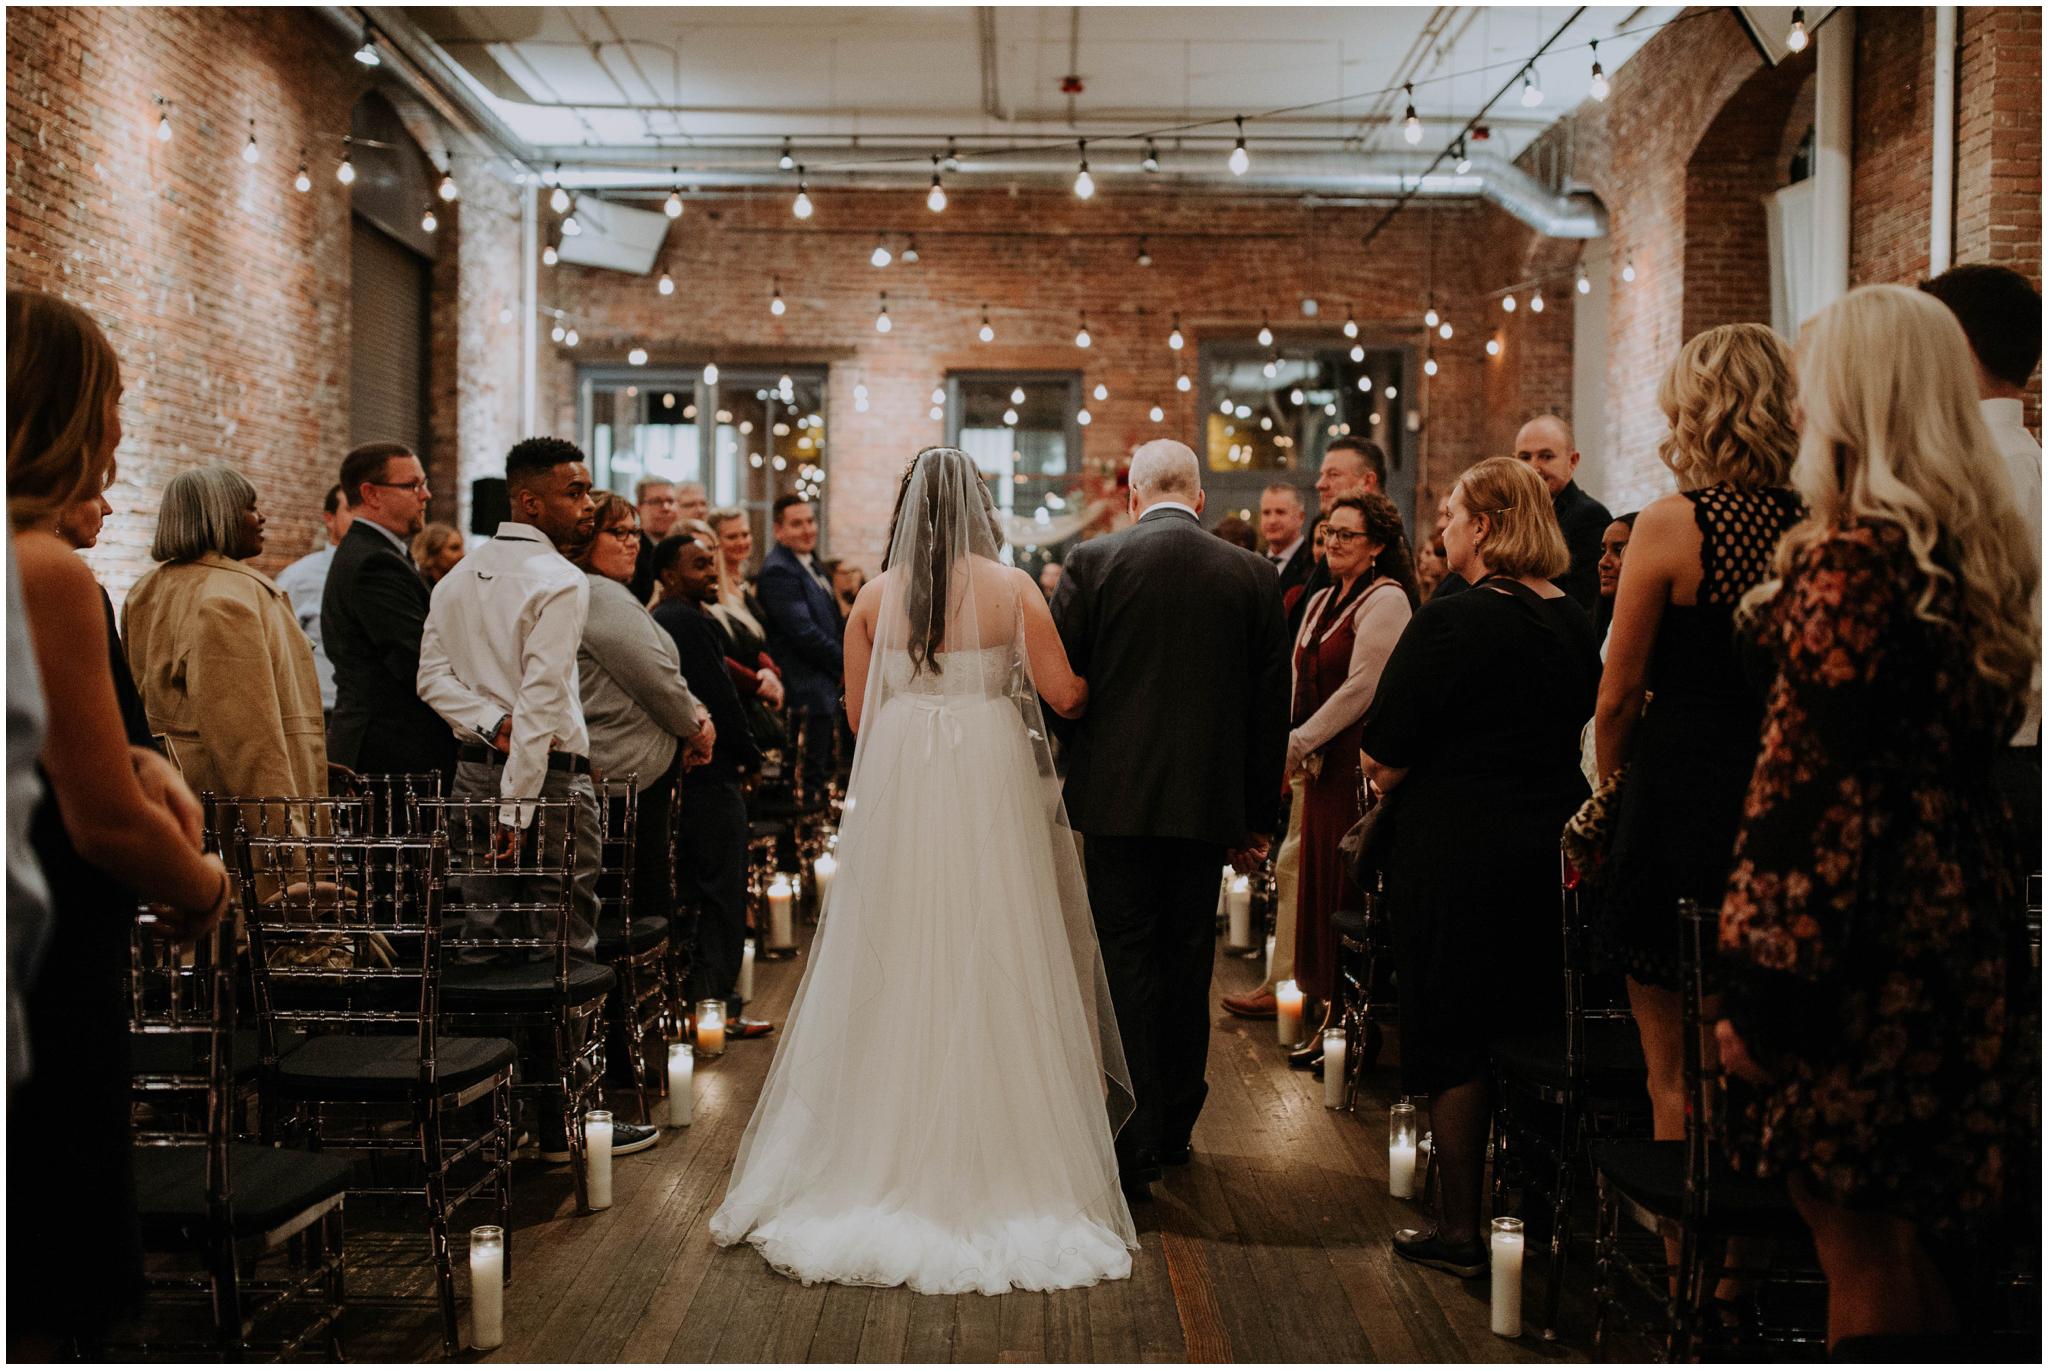 danny+mackenzie+downtown-seattle-axis-wedding-seattle-photographer-076.jpg